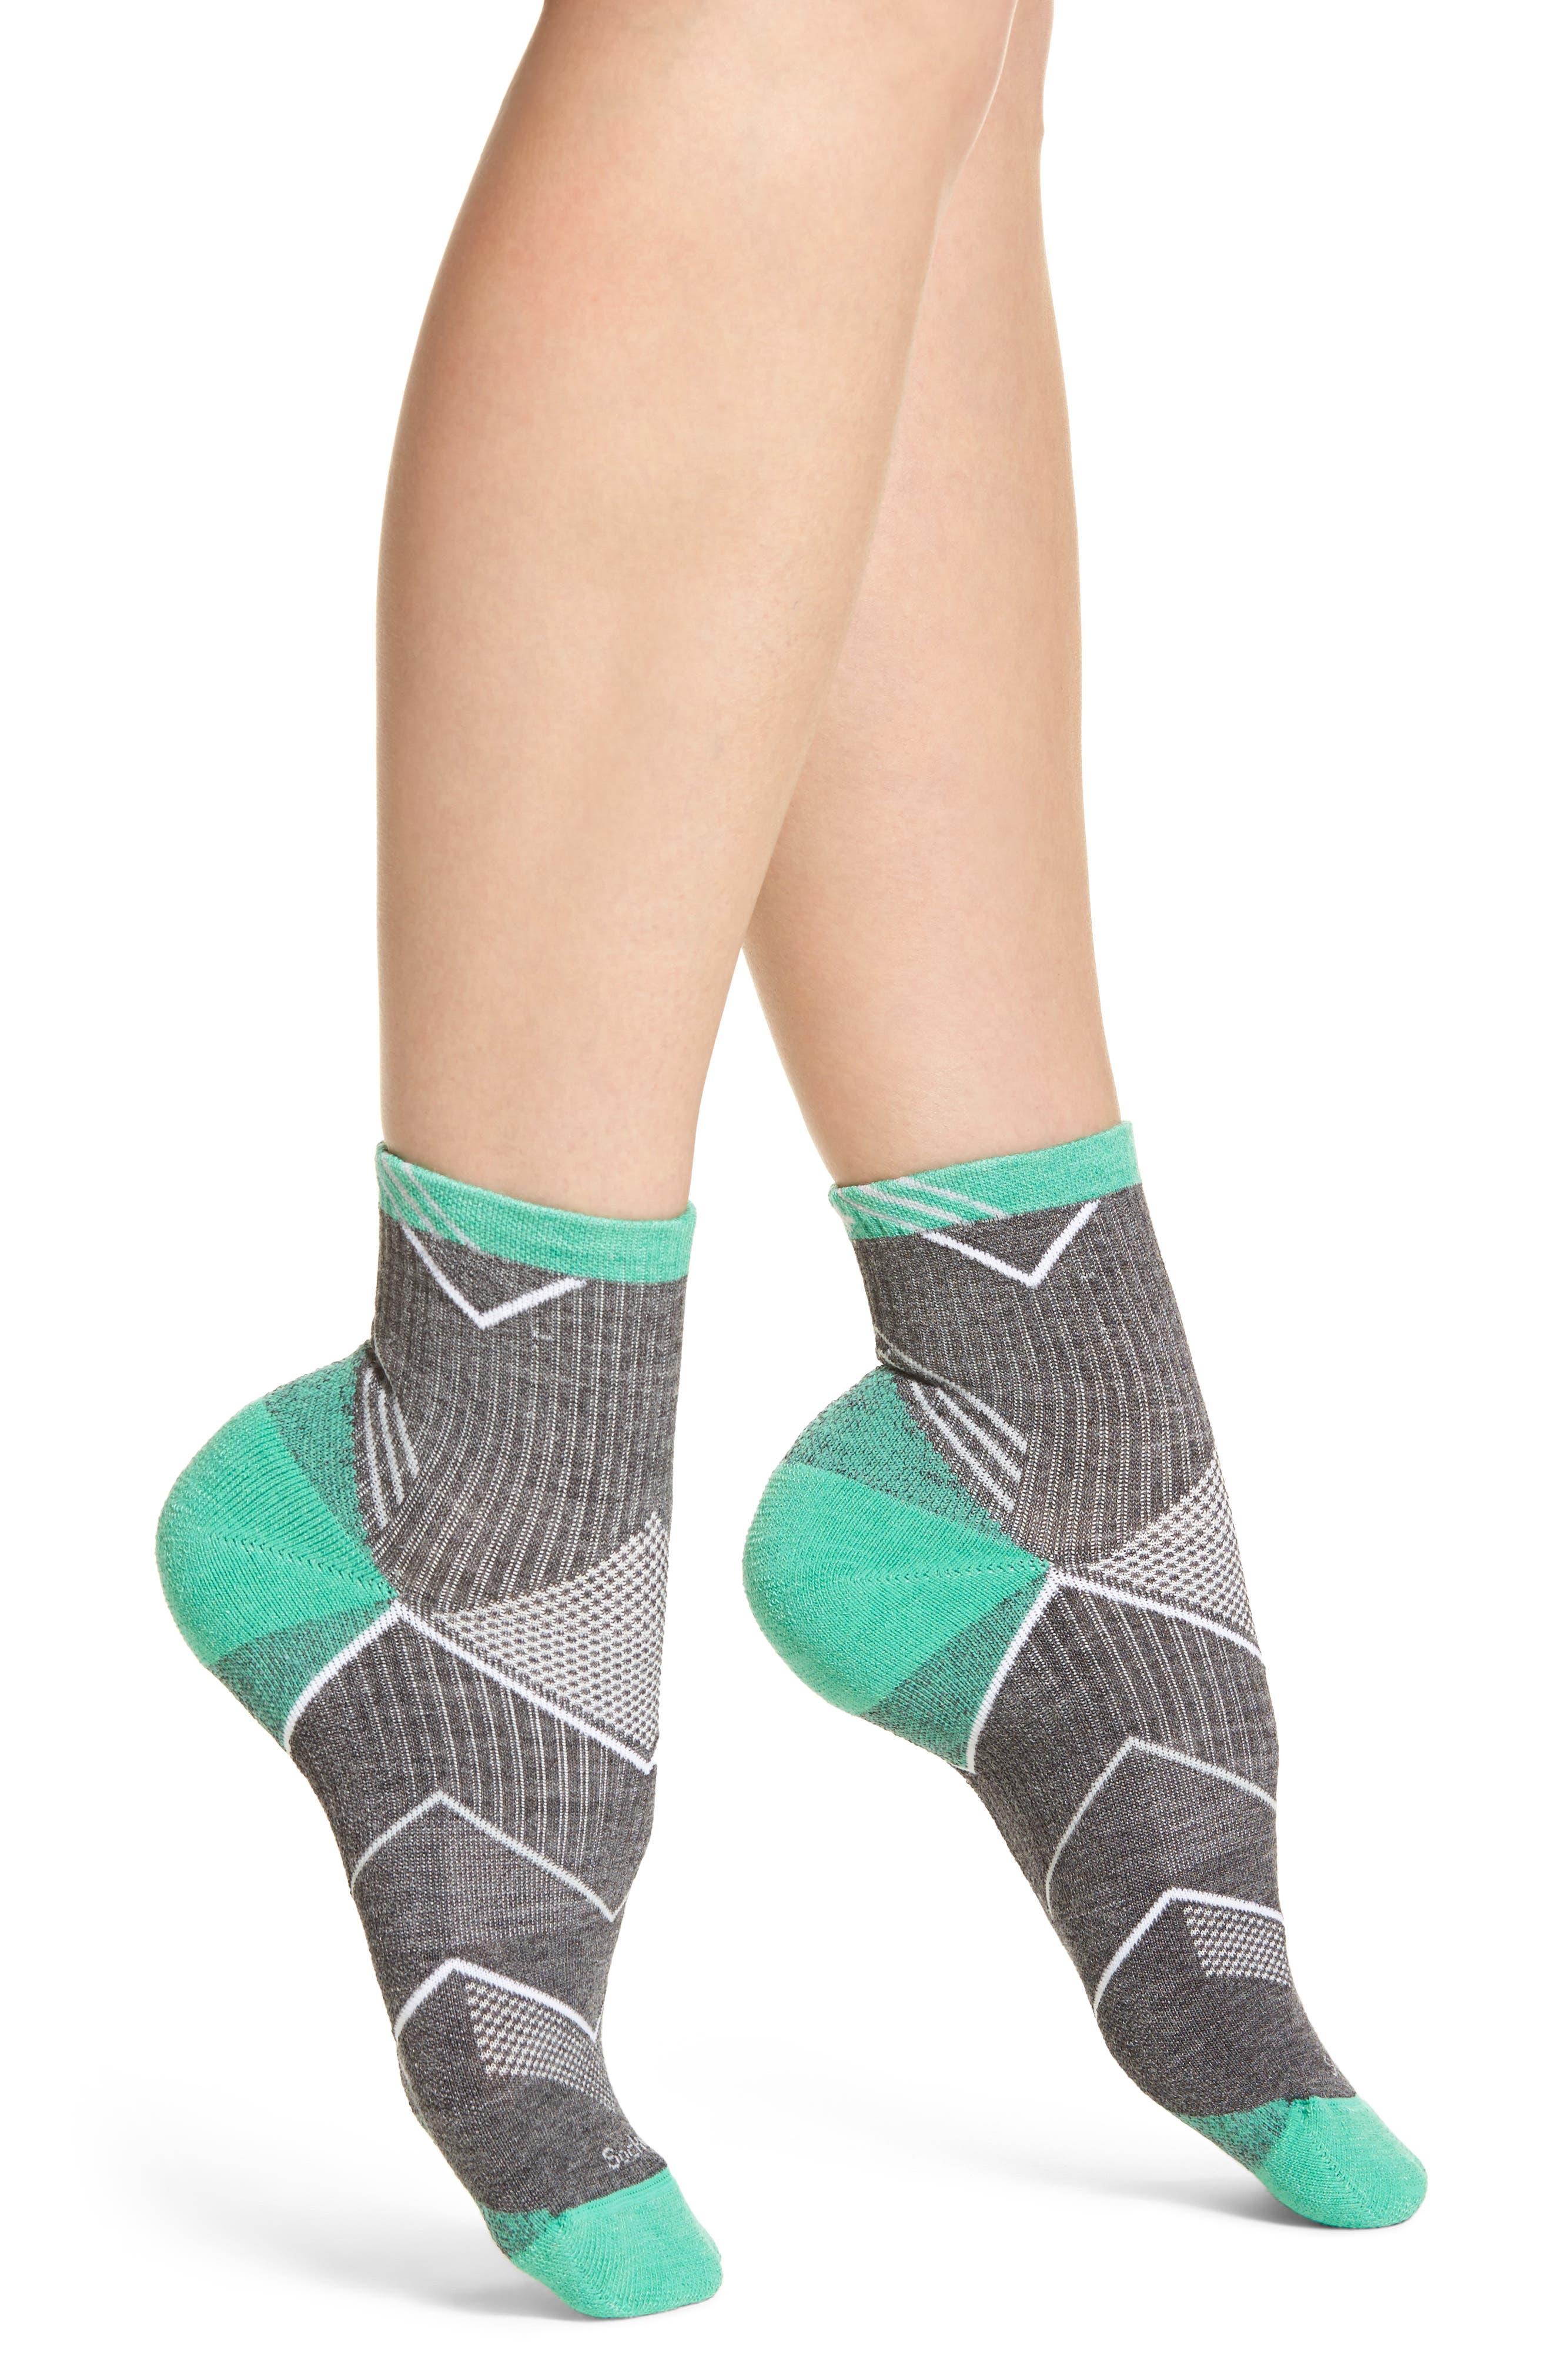 Quarter Socks,                         Main,                         color, Charcoal